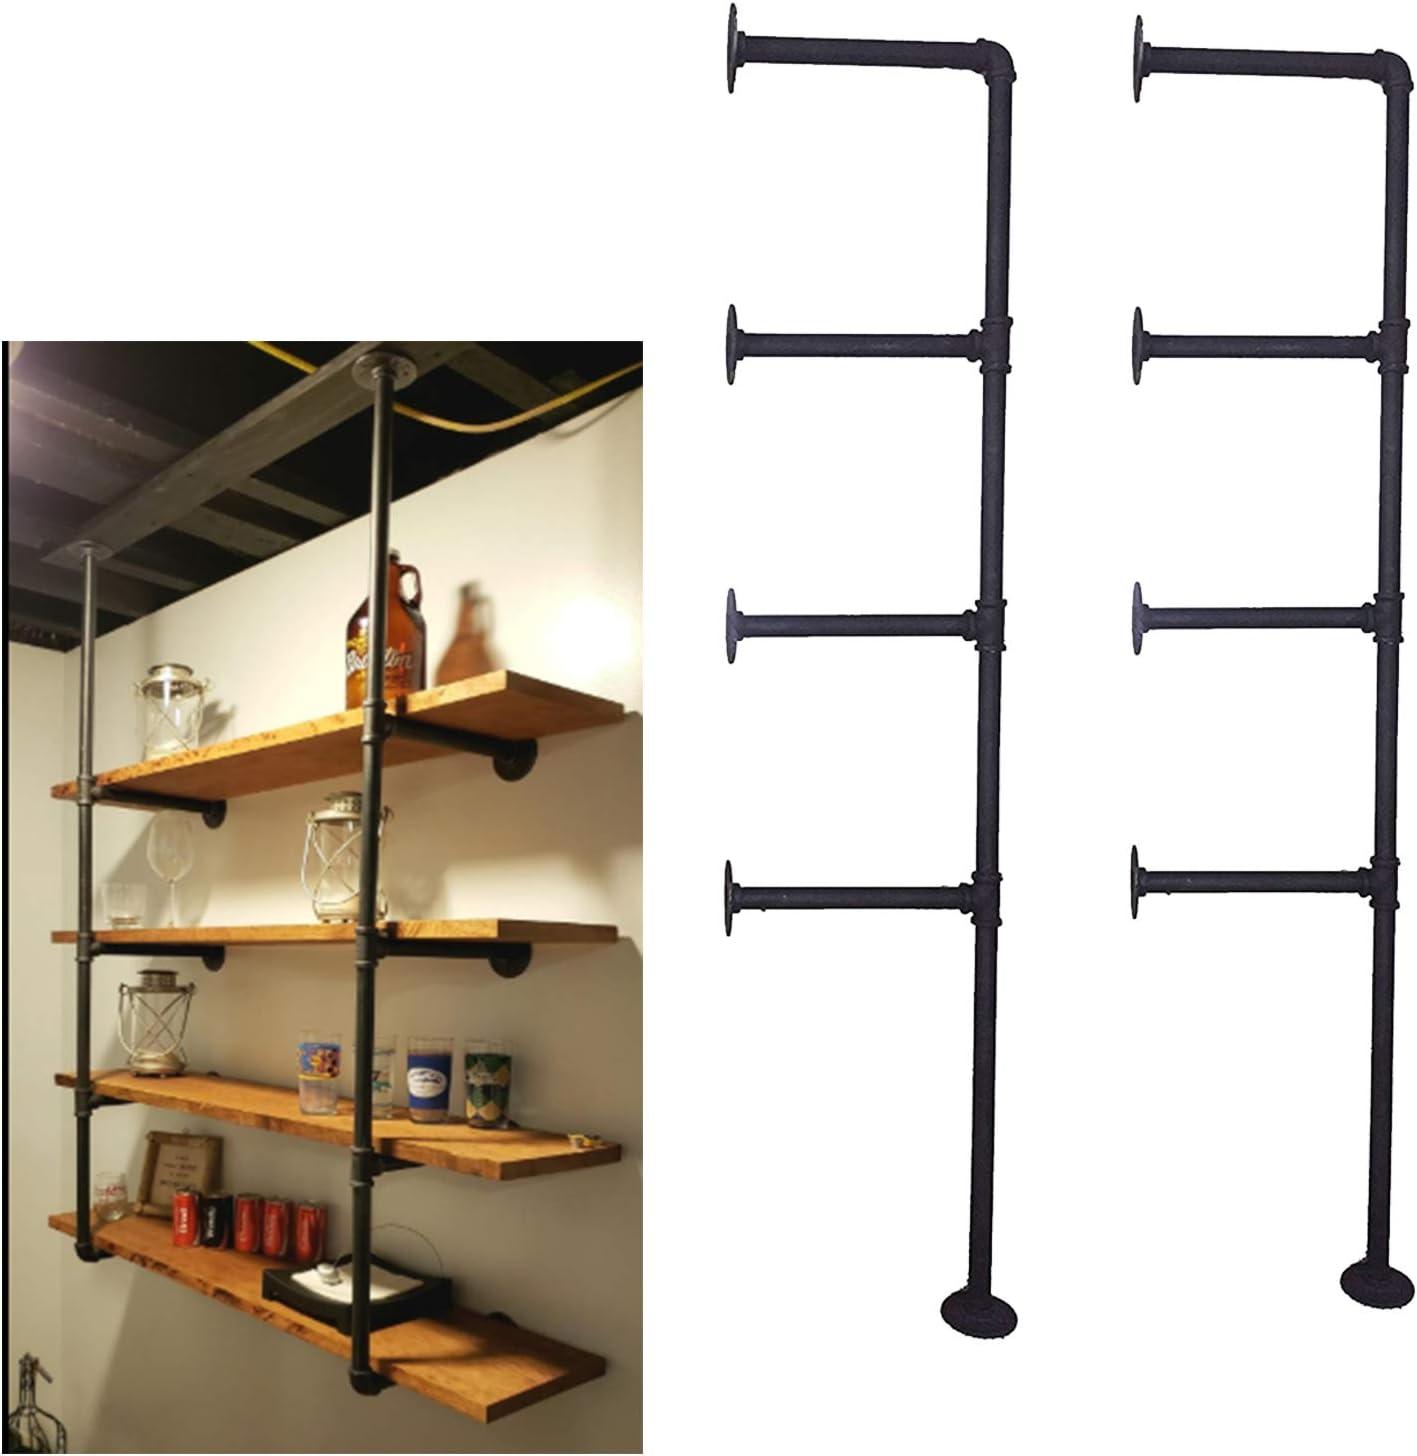 FUQI 4-Shelf Bookcase, Industrial Retro Floating Wall Mount Iron Pipe Shelf, DIY Storage Shelving Bookshelf (2 pcs)